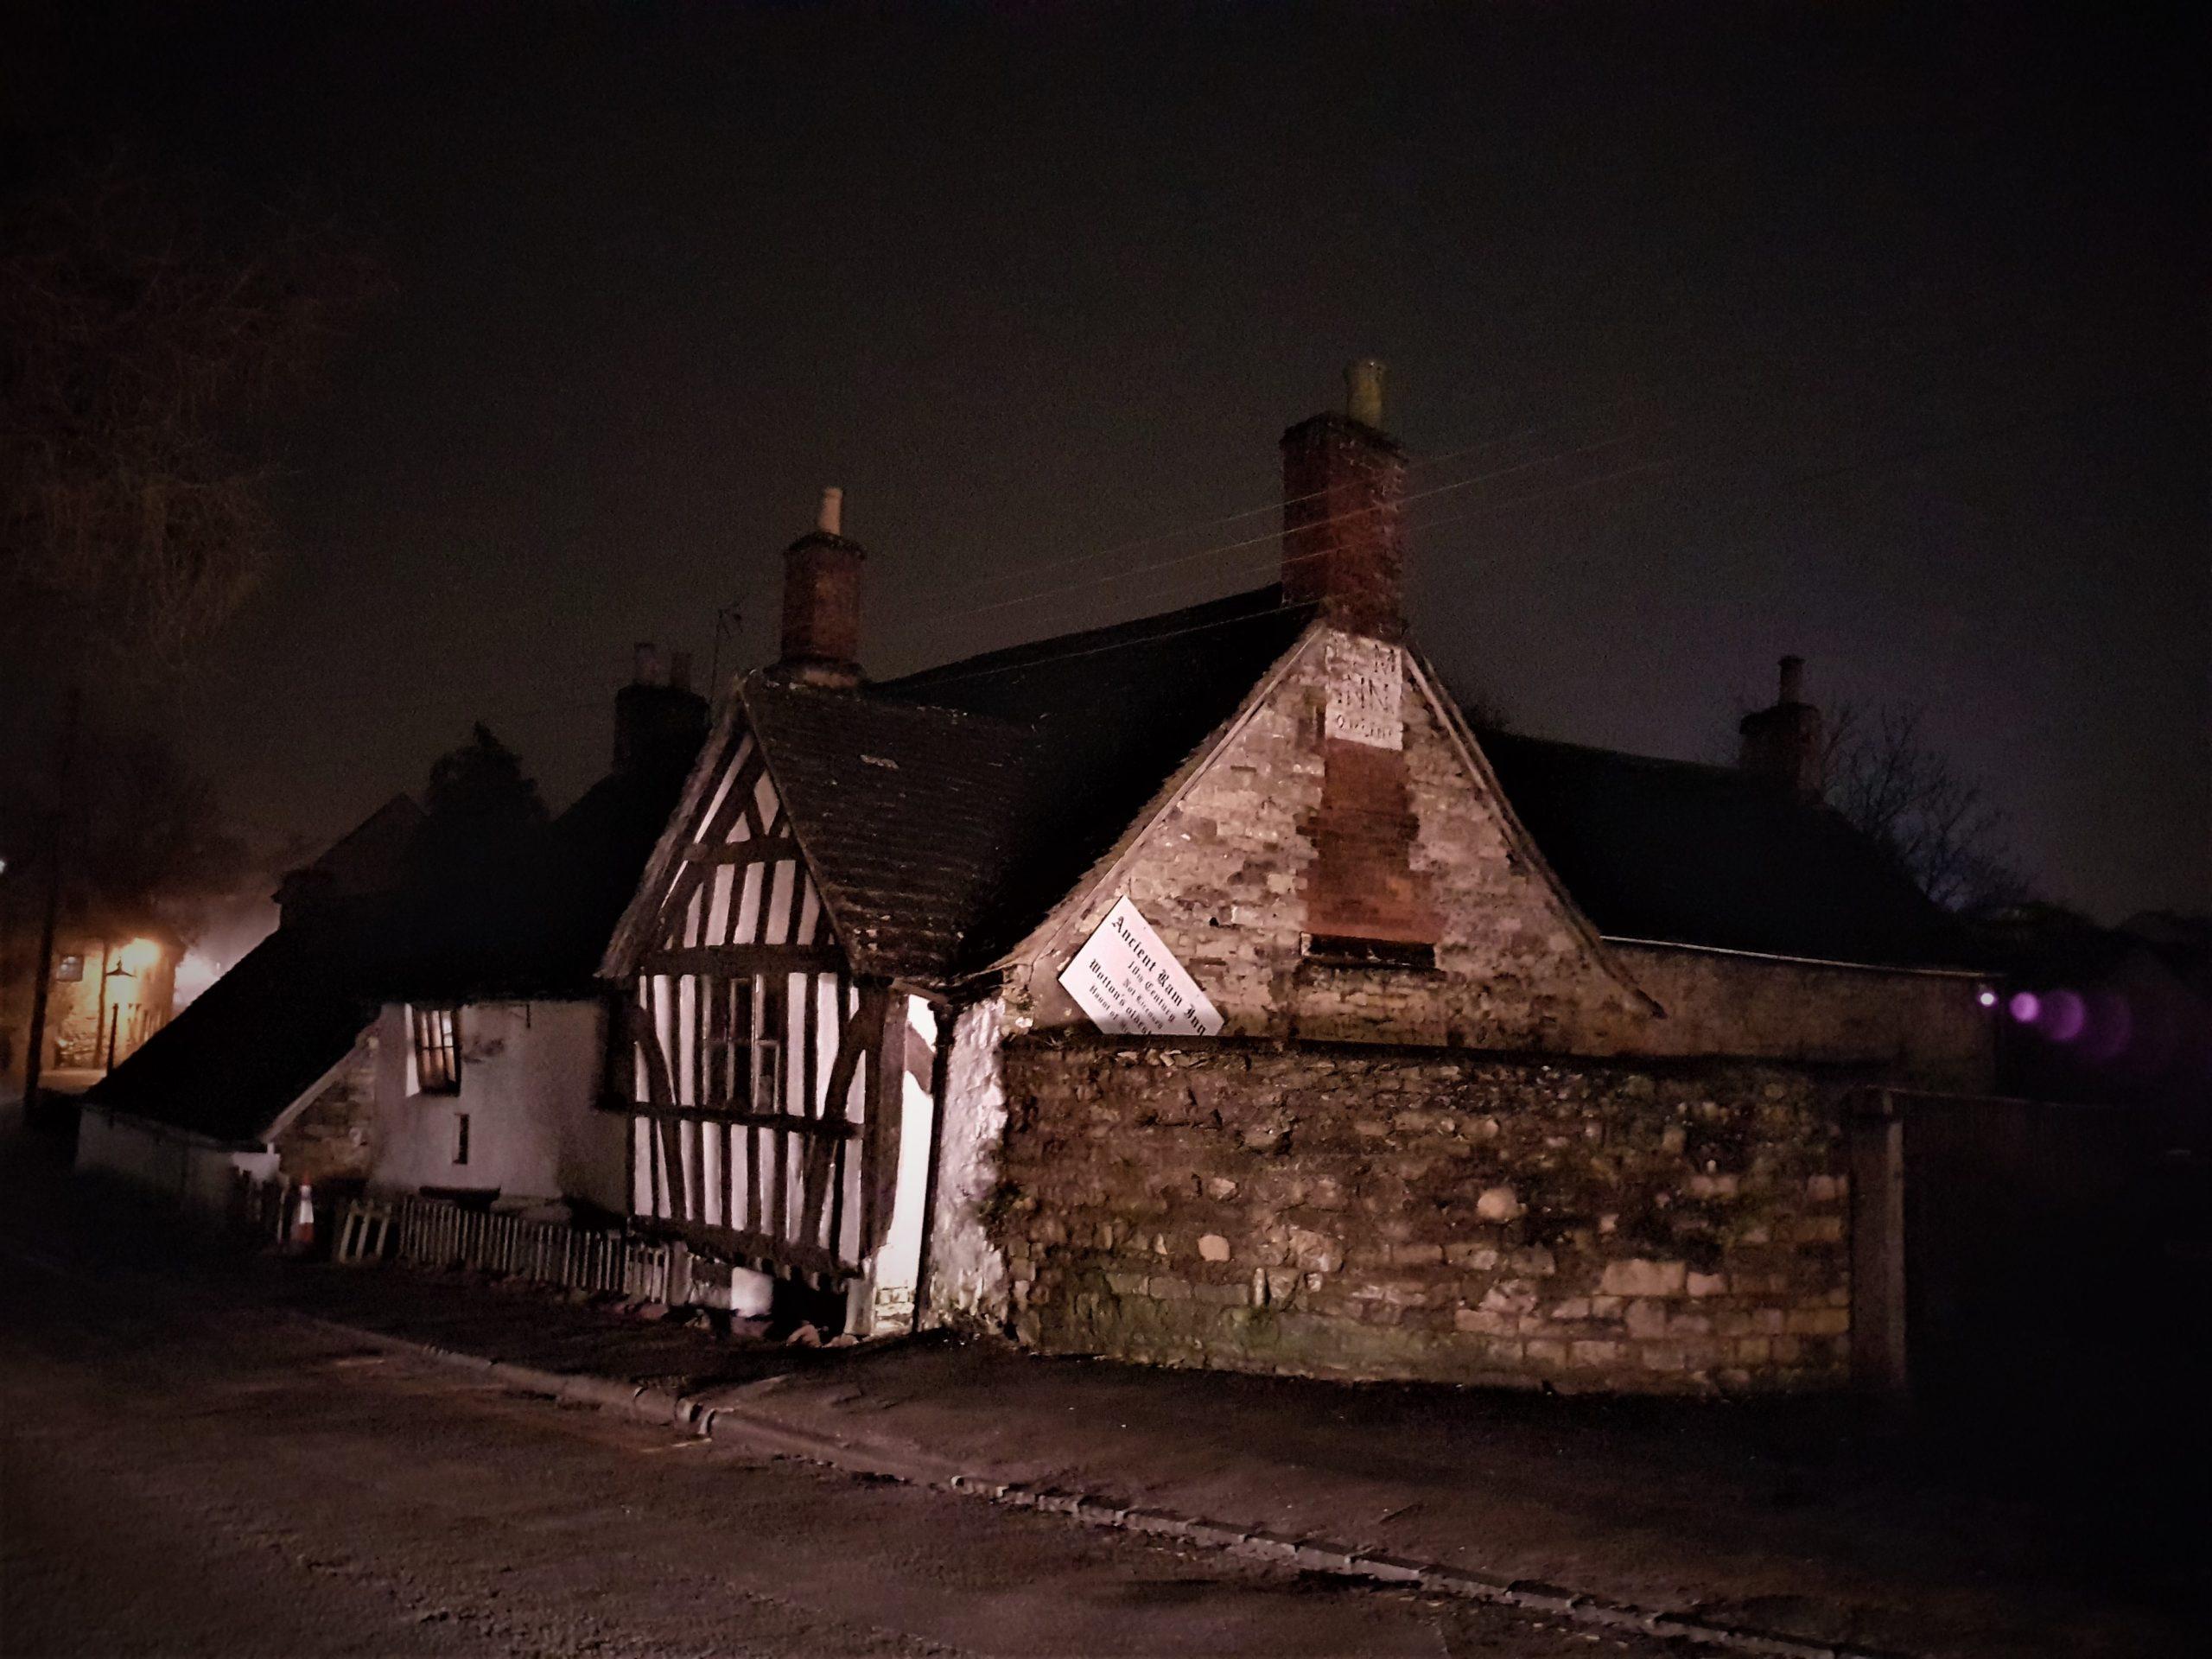 The Ancient Ram Inn – Wotton-under-Edge, Gloucestershire